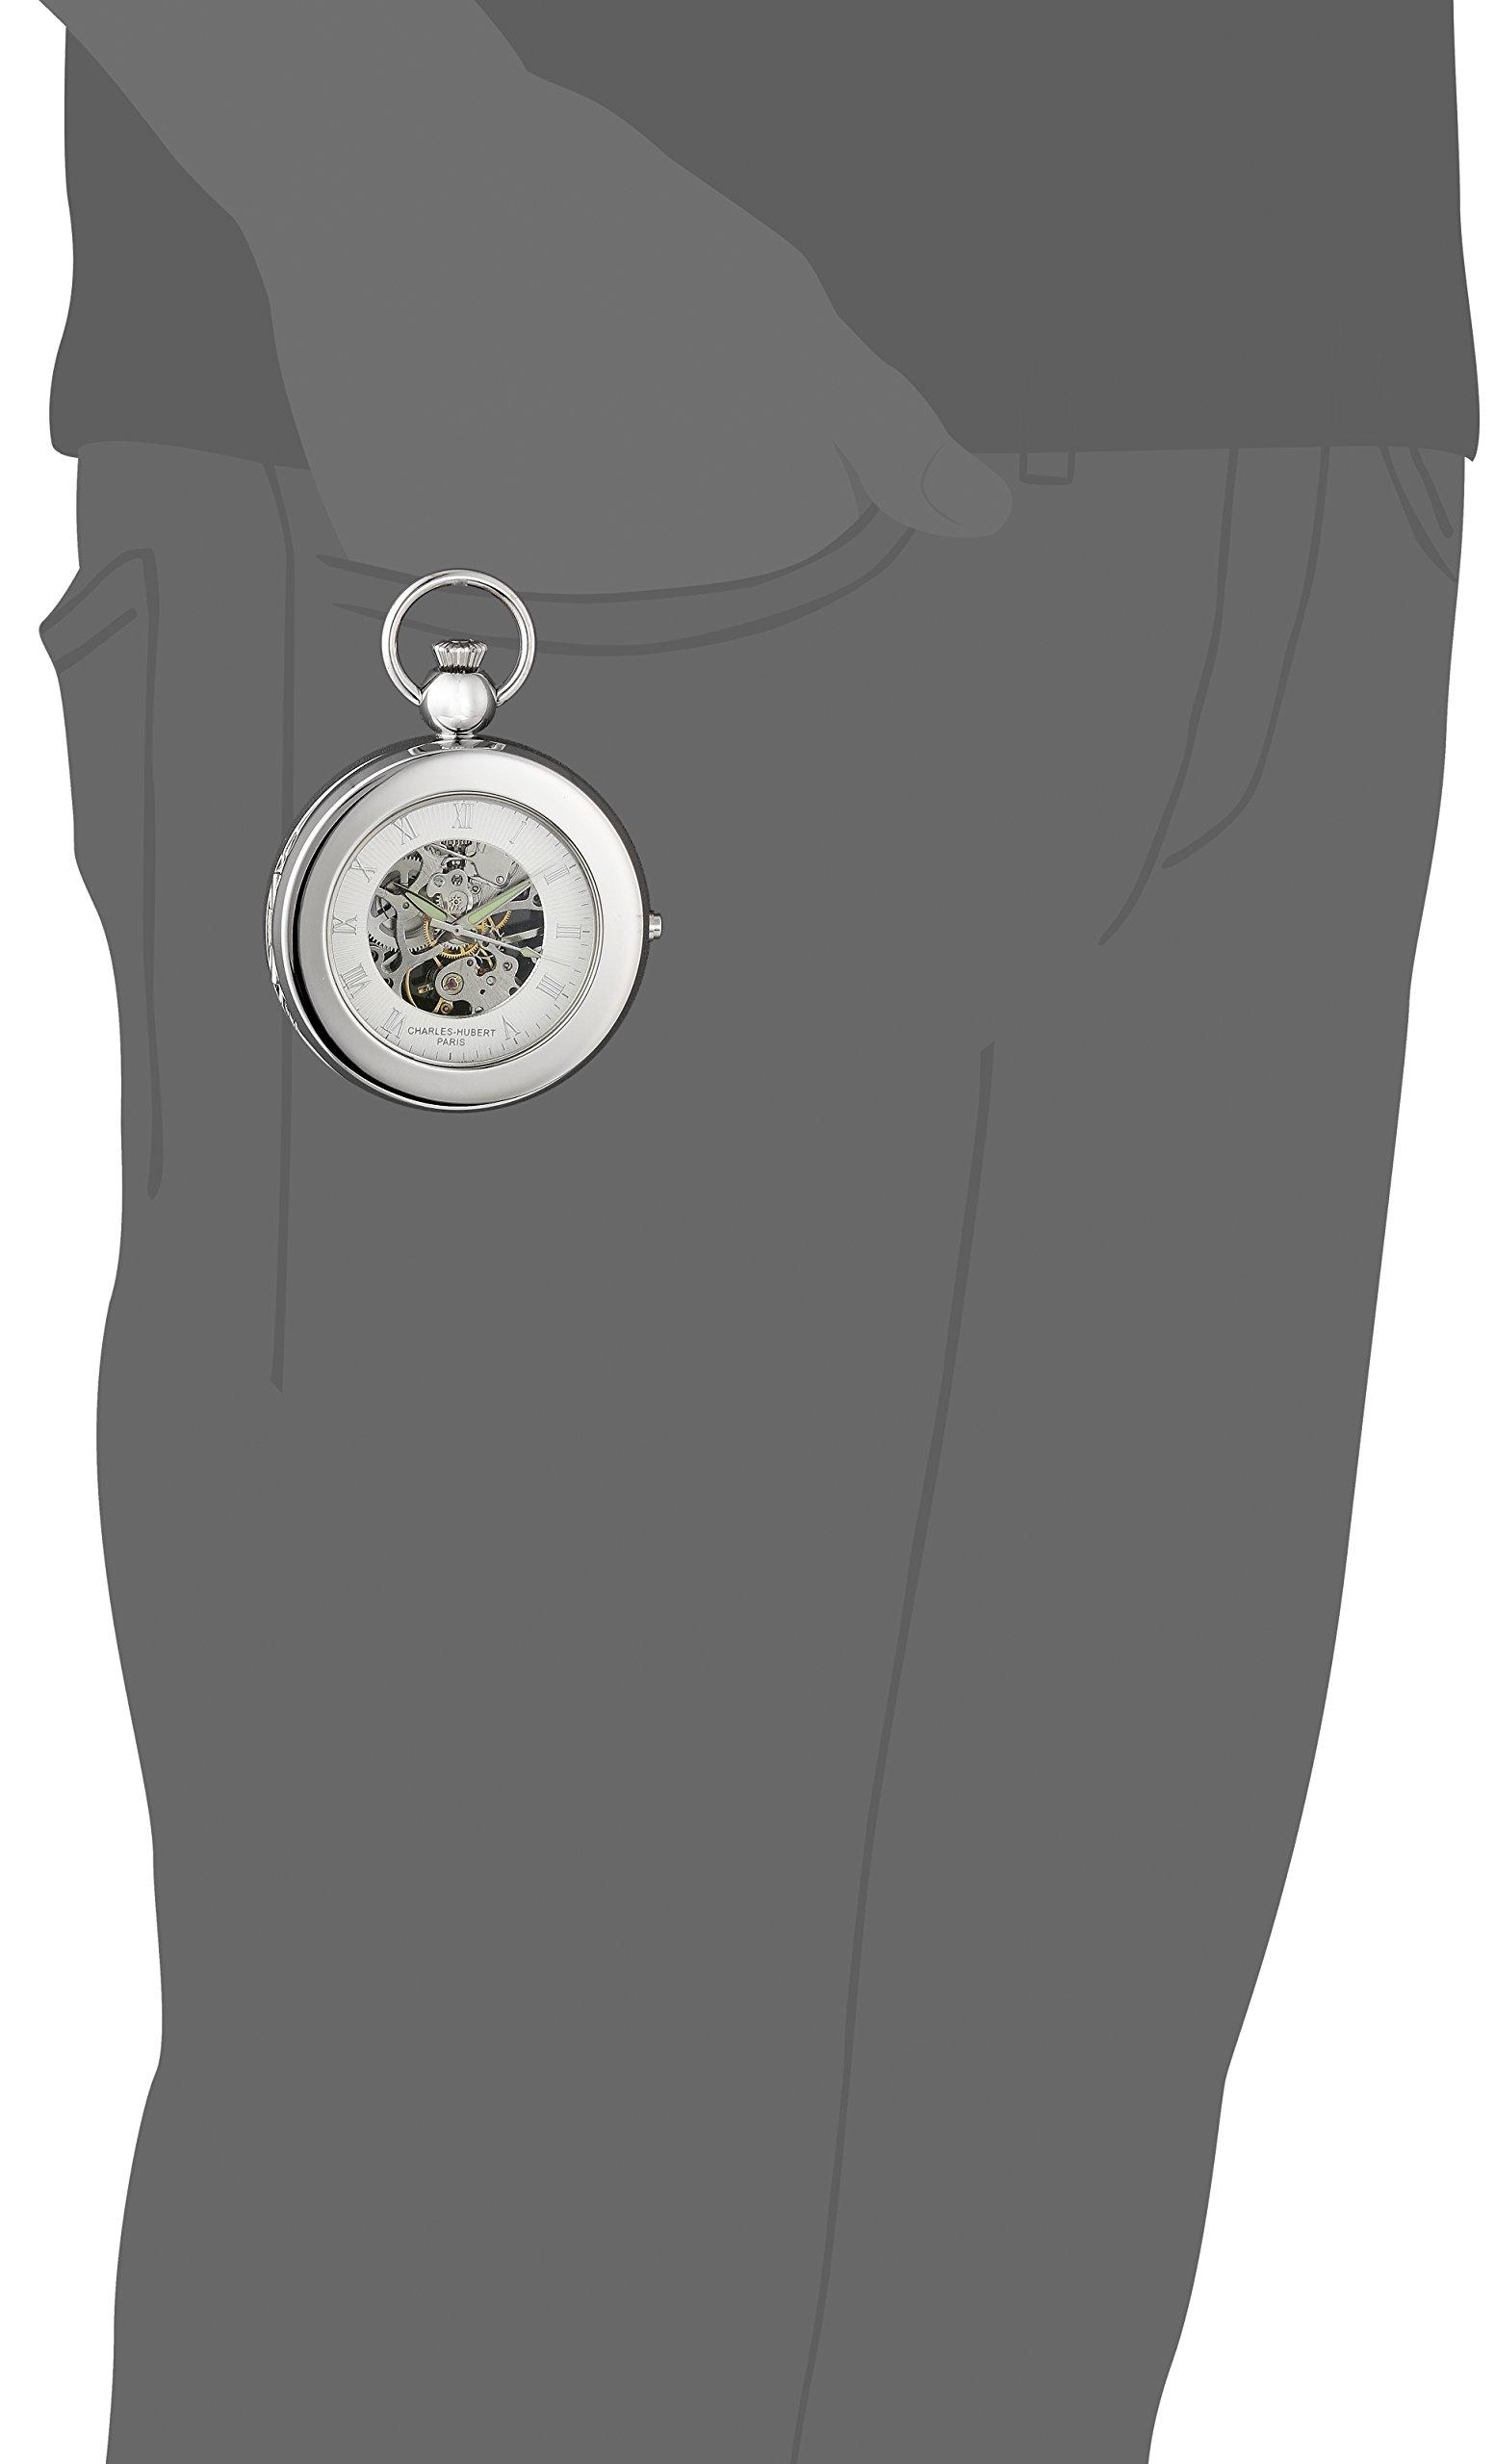 Charles Hubert 3849 Mechanical Picture Frame Pocket Watch by CHARLES-HUBERT PARIS (Image #4)